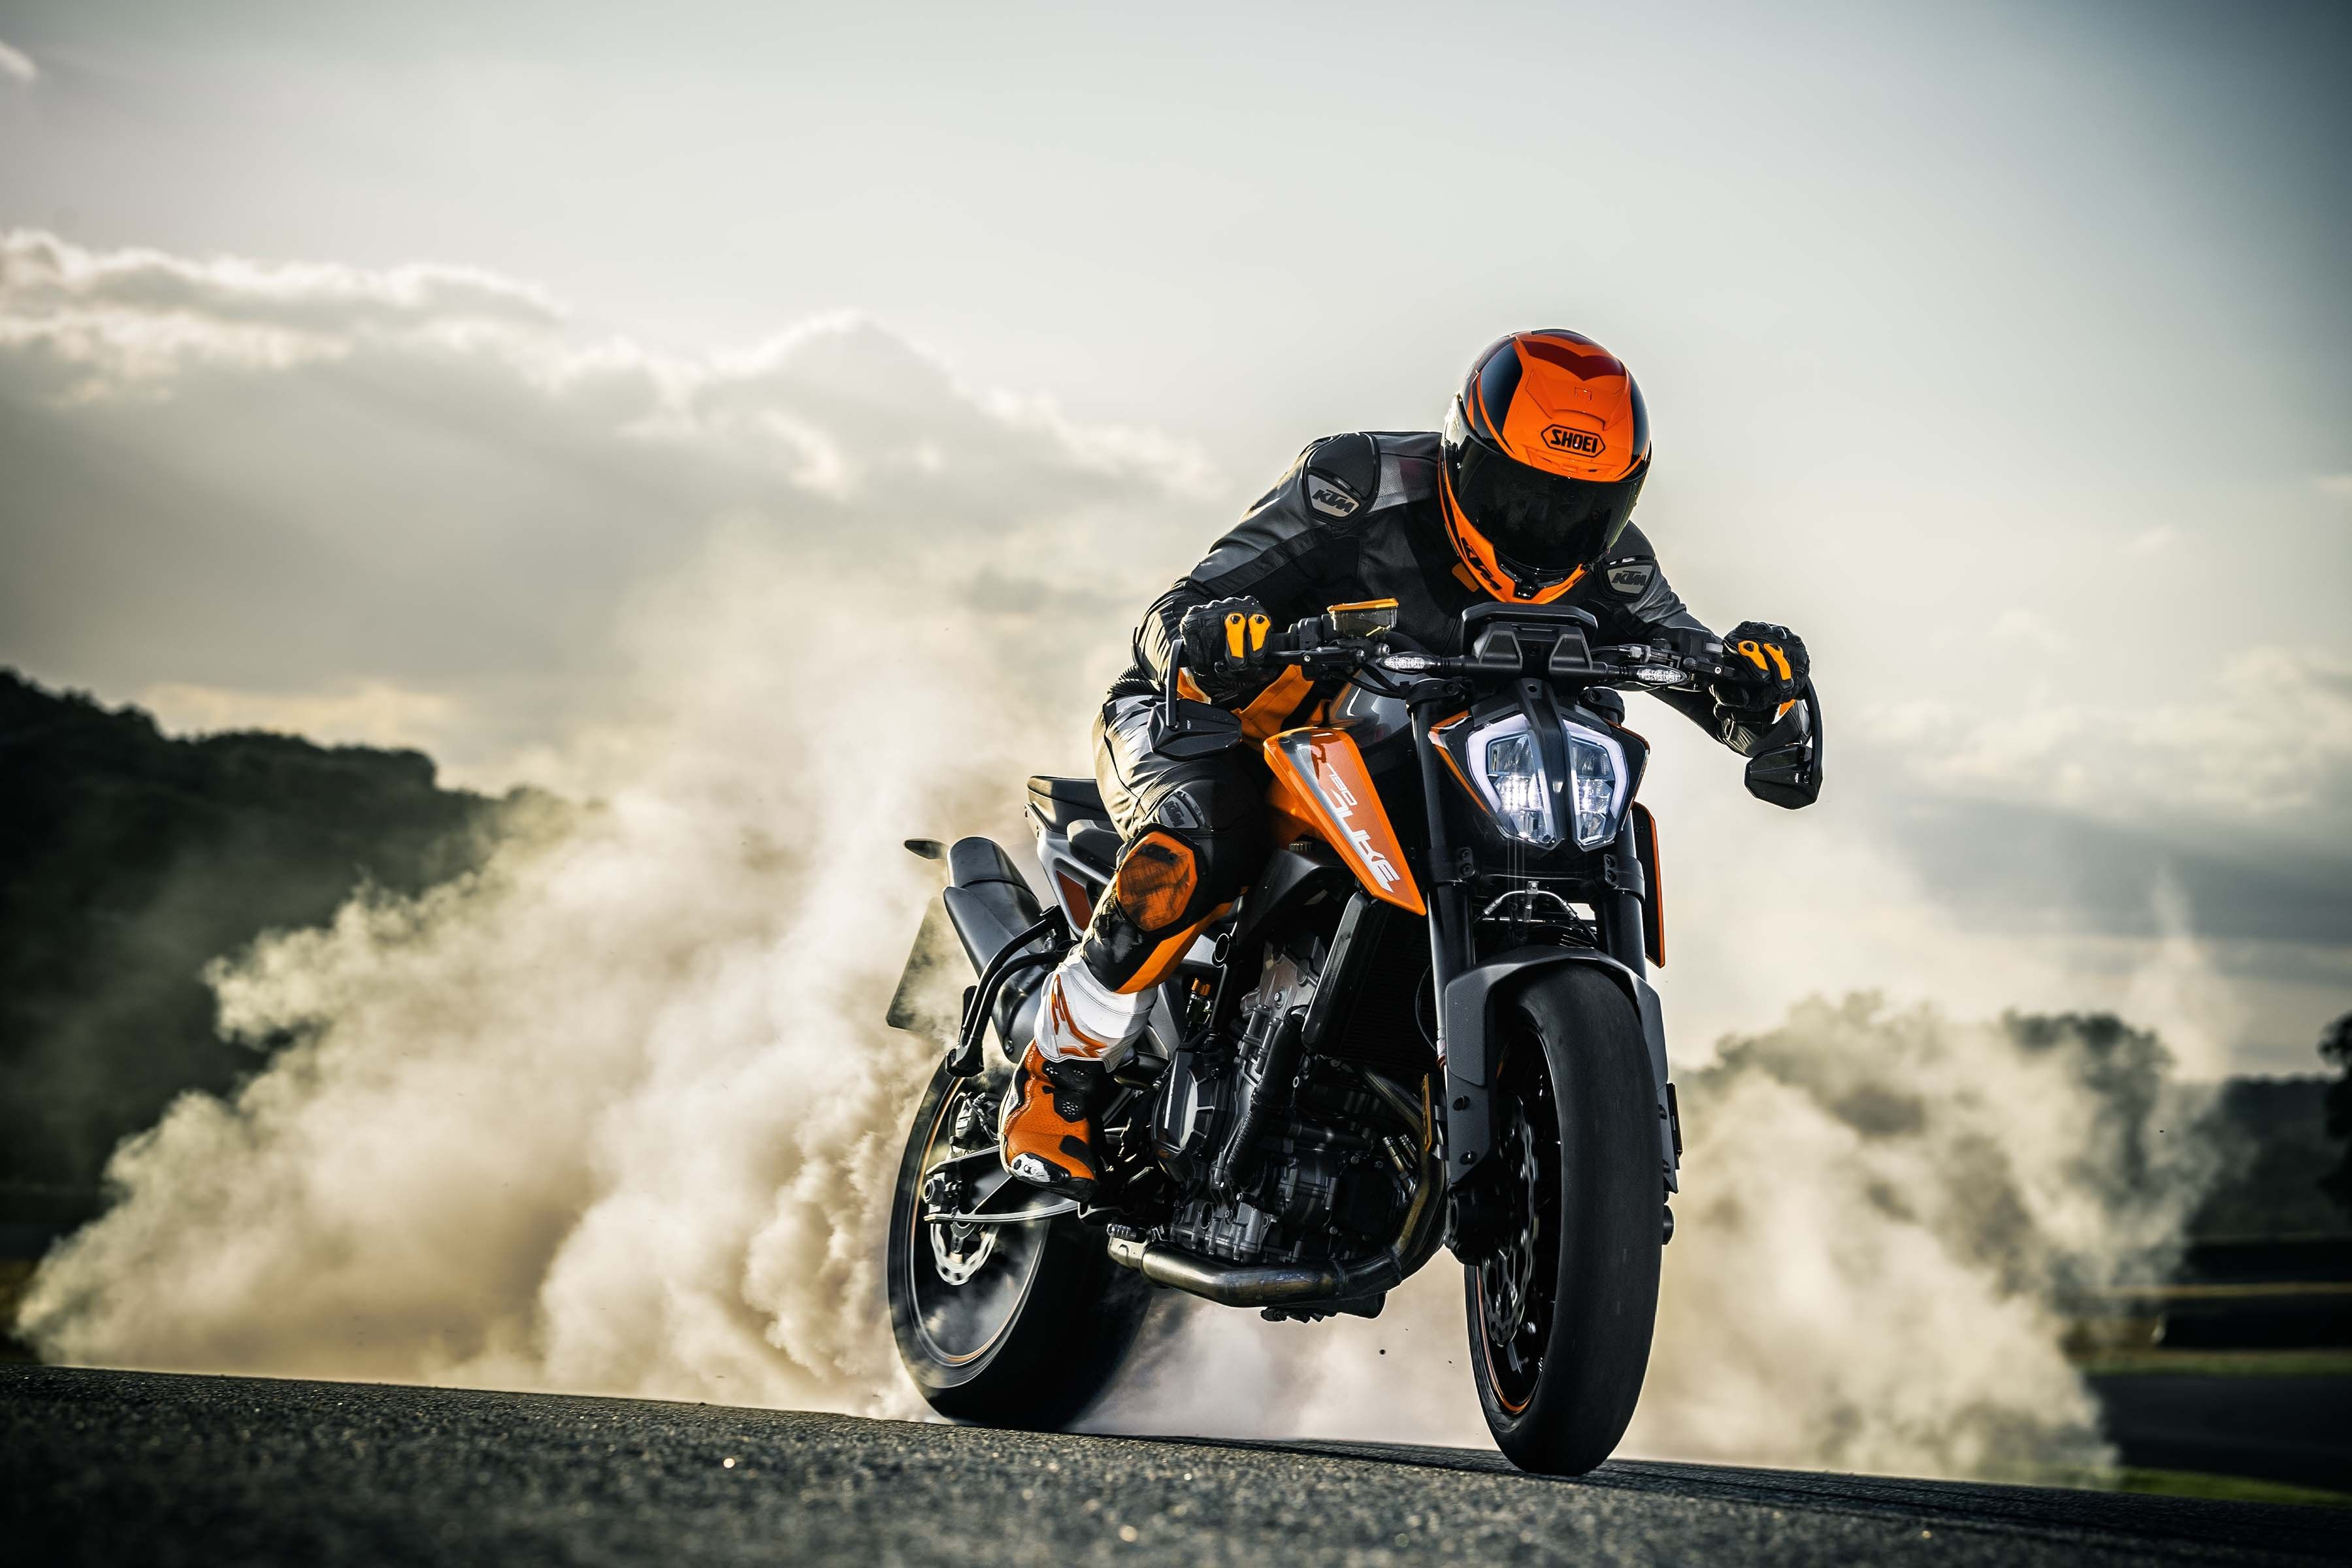 Pin By Zabilmohd On Scrambler Bike Drift Motorcycle Wallpaper